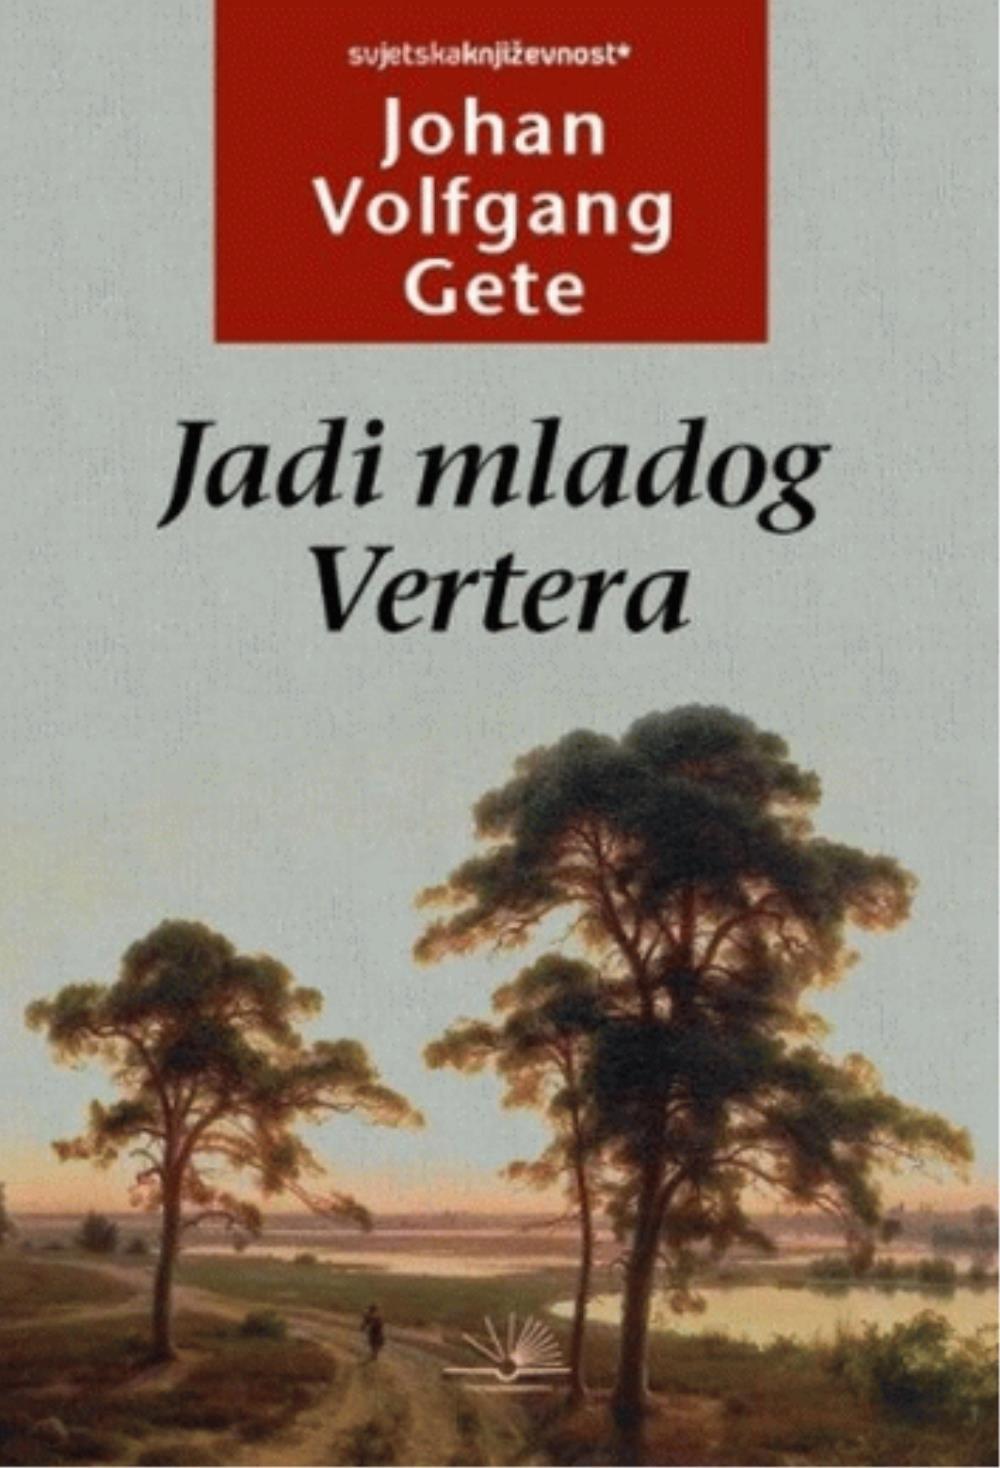 Jadi mladog Vertera - Johan Volfgang Gete - Online